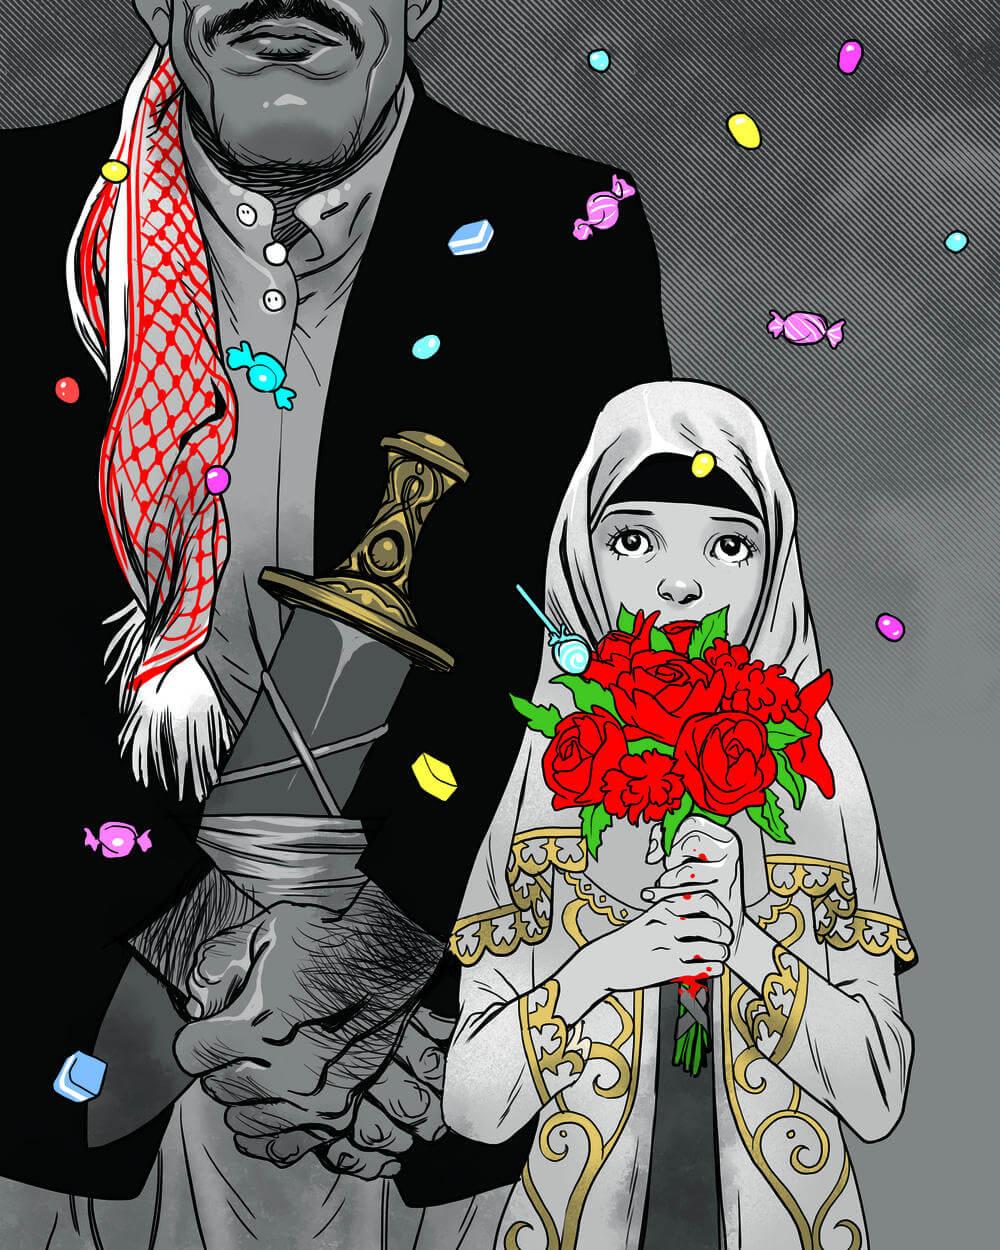 asaf hanuka illustration 3